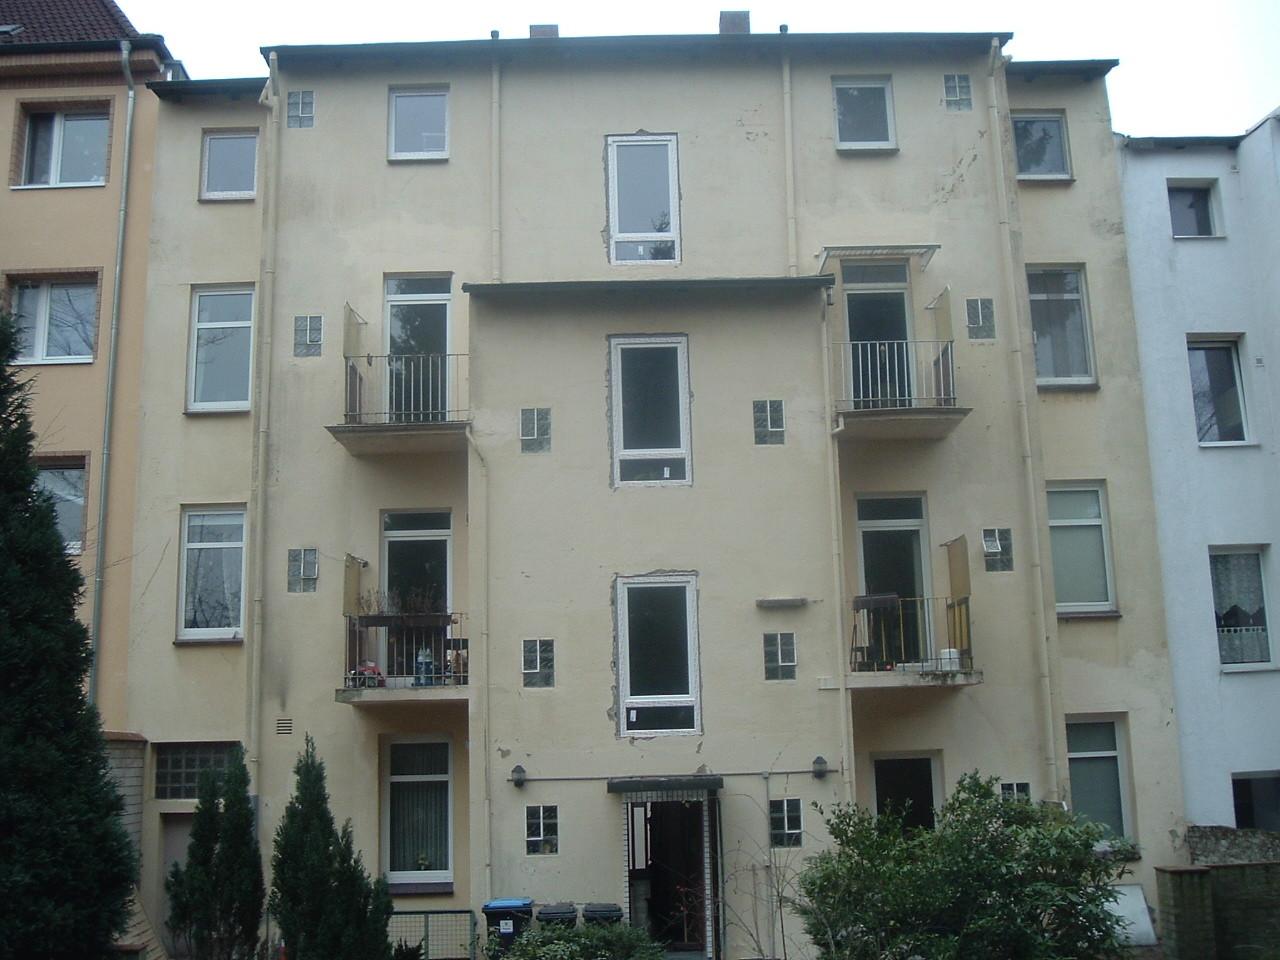 Hinterhof-Fassaden-Wärmedämmung vorher